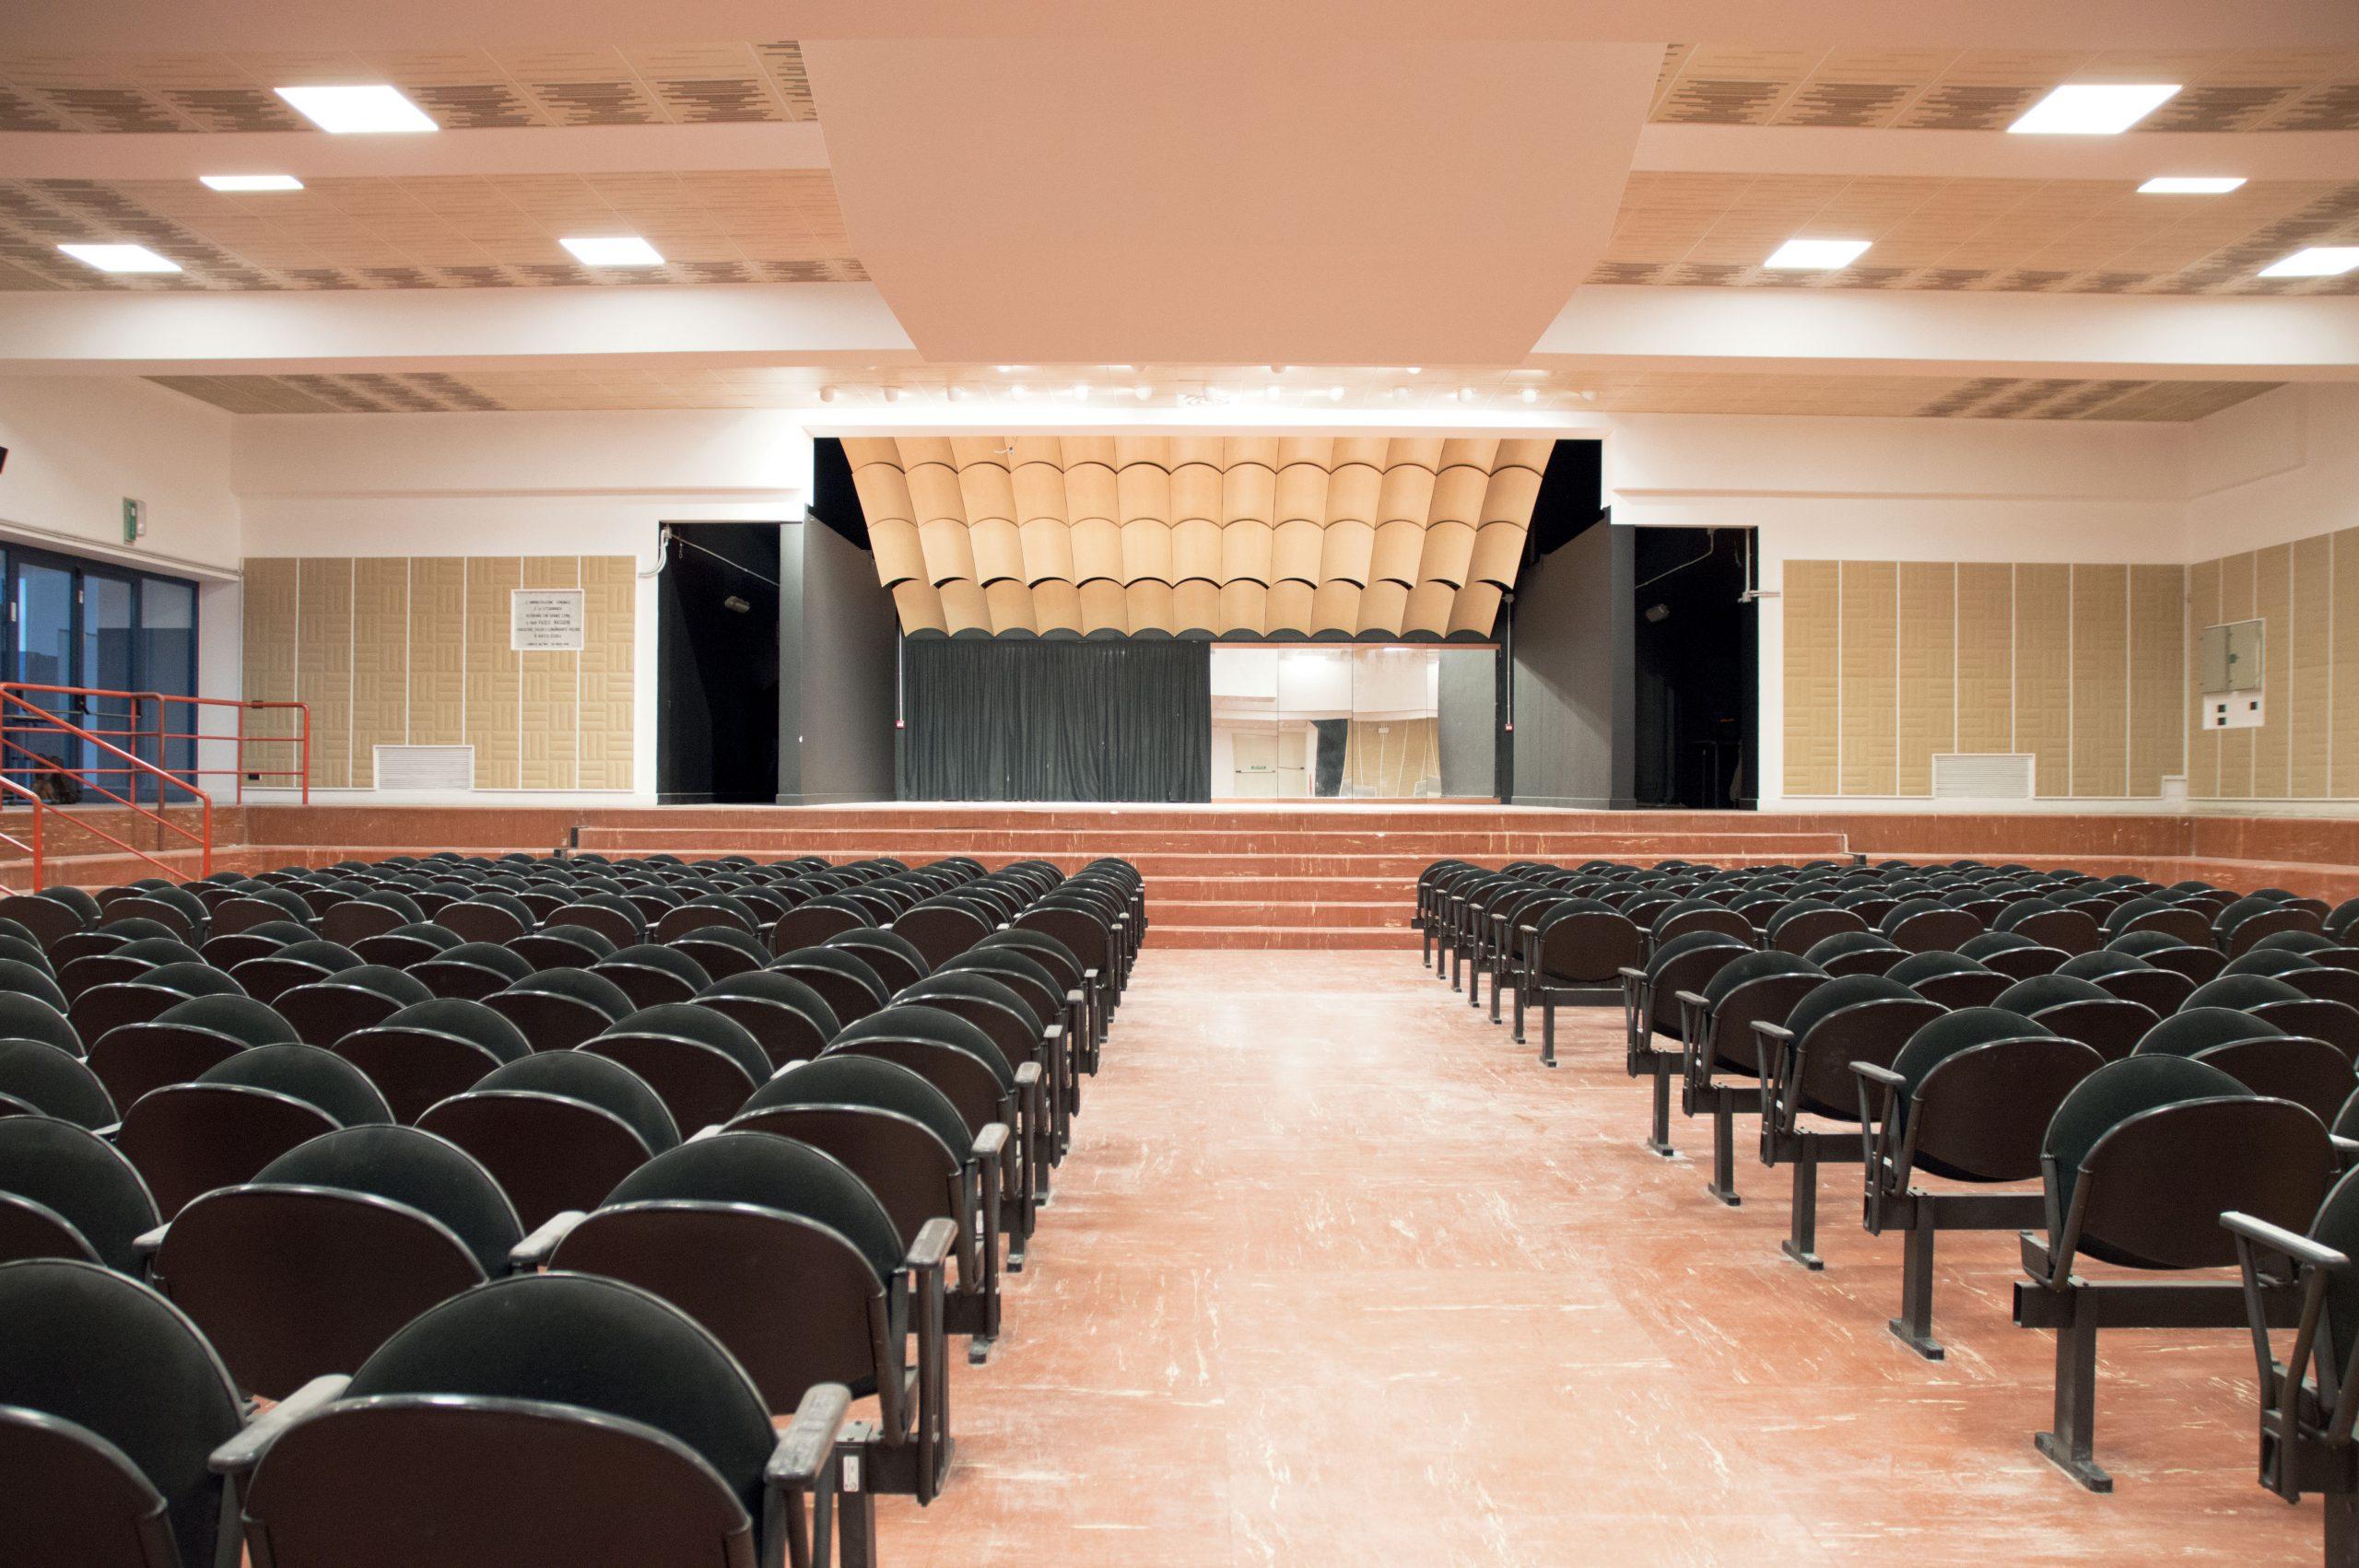 Tiyatro Salonu Akustik Ses Yalıtımı Fiyatları Ankara